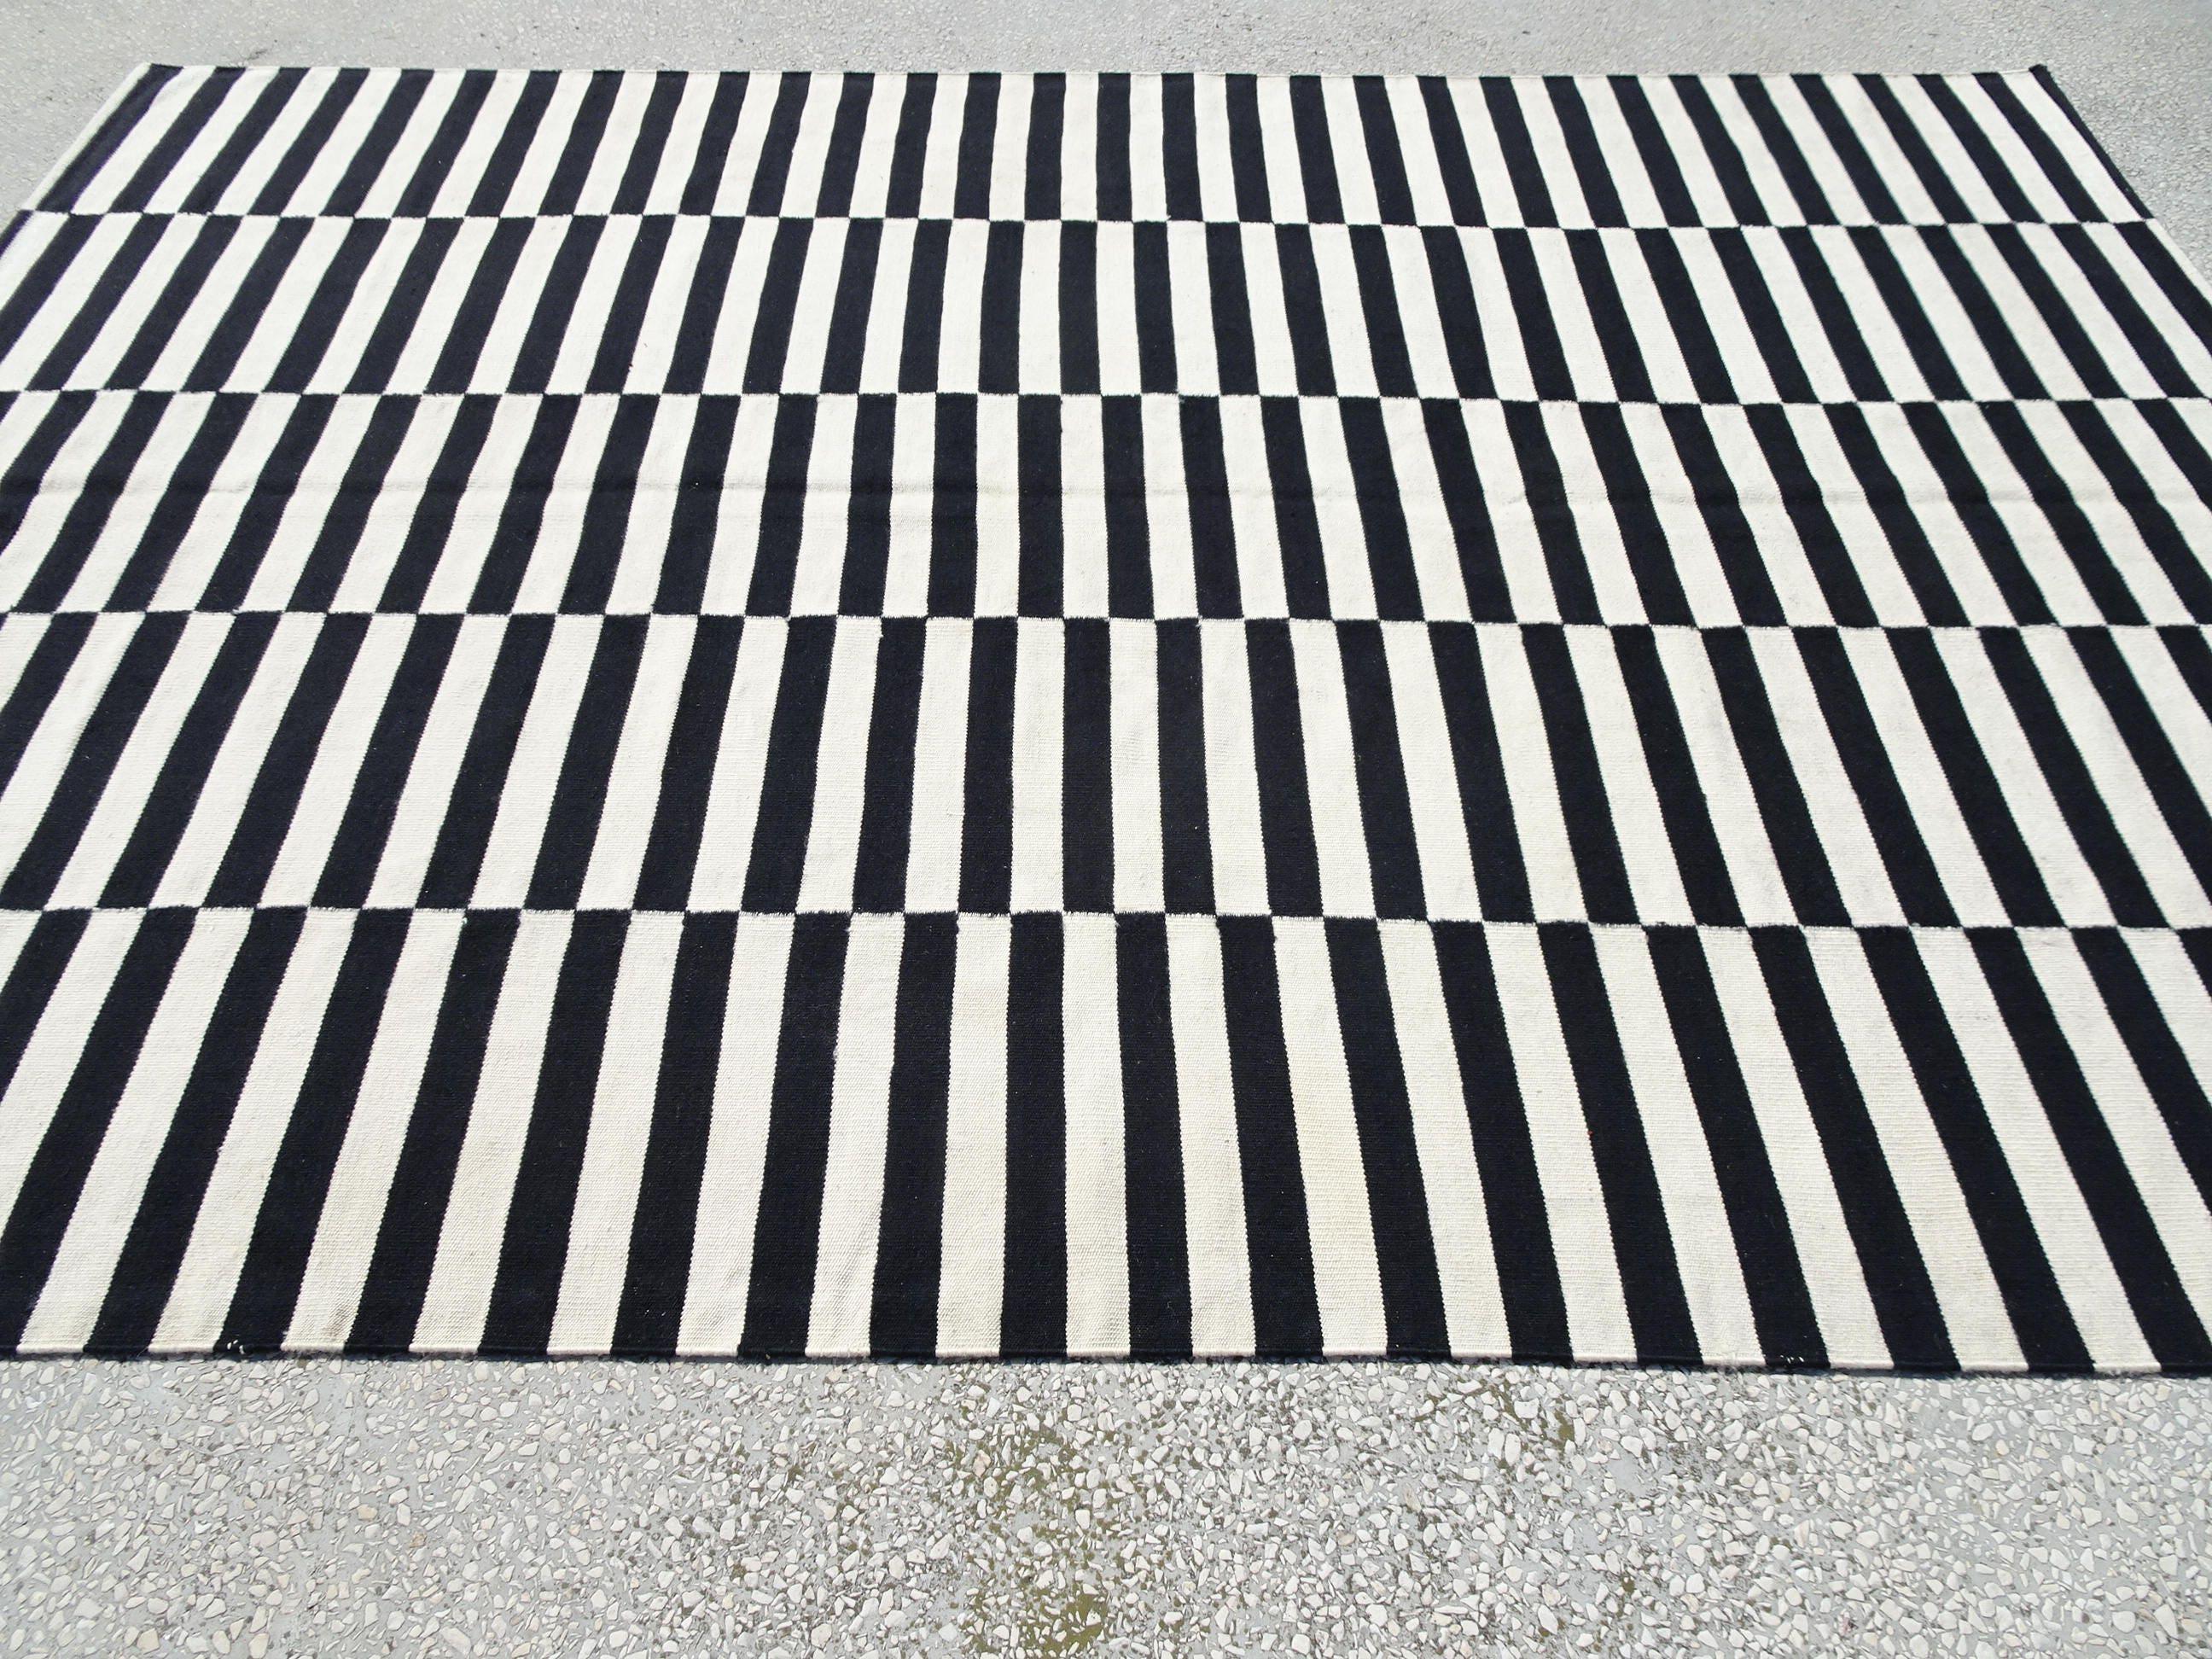 Black And White Rug,11,2x7,6 Feet 340x230 Cm Vintage Home Decor ...